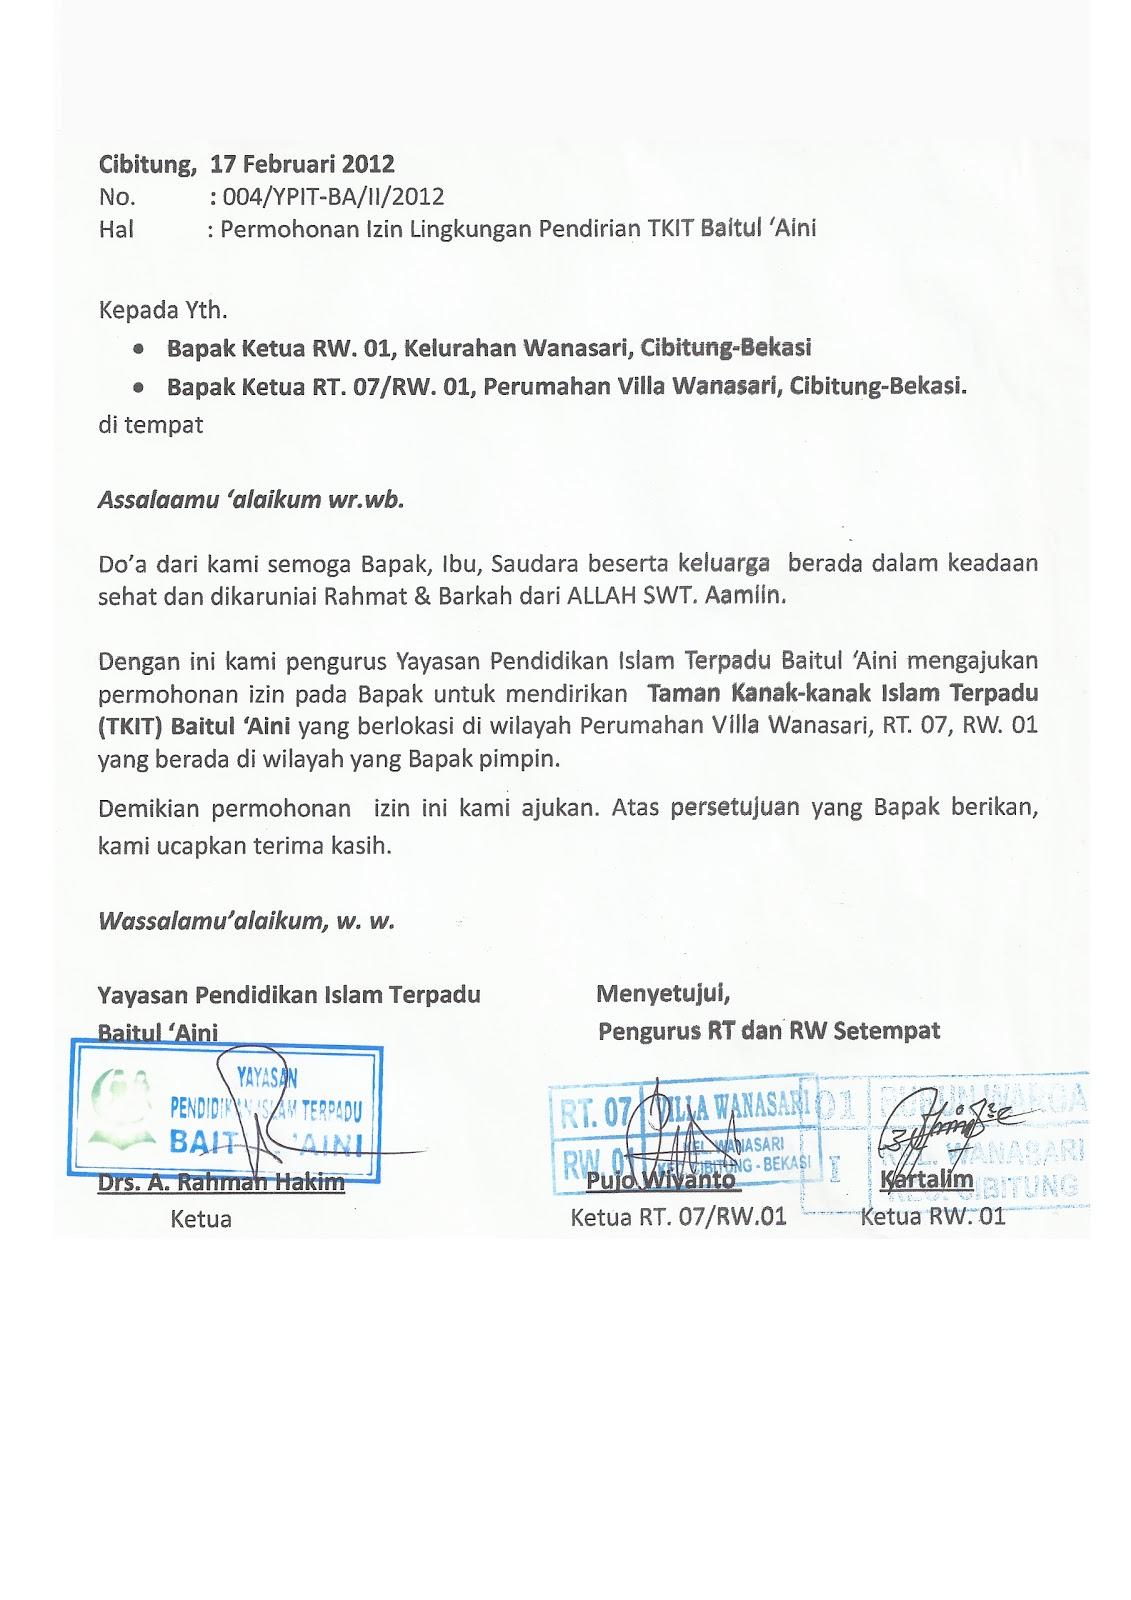 Tkit Tpq Baitul Aini Contoh Surat Izin Lingkungan